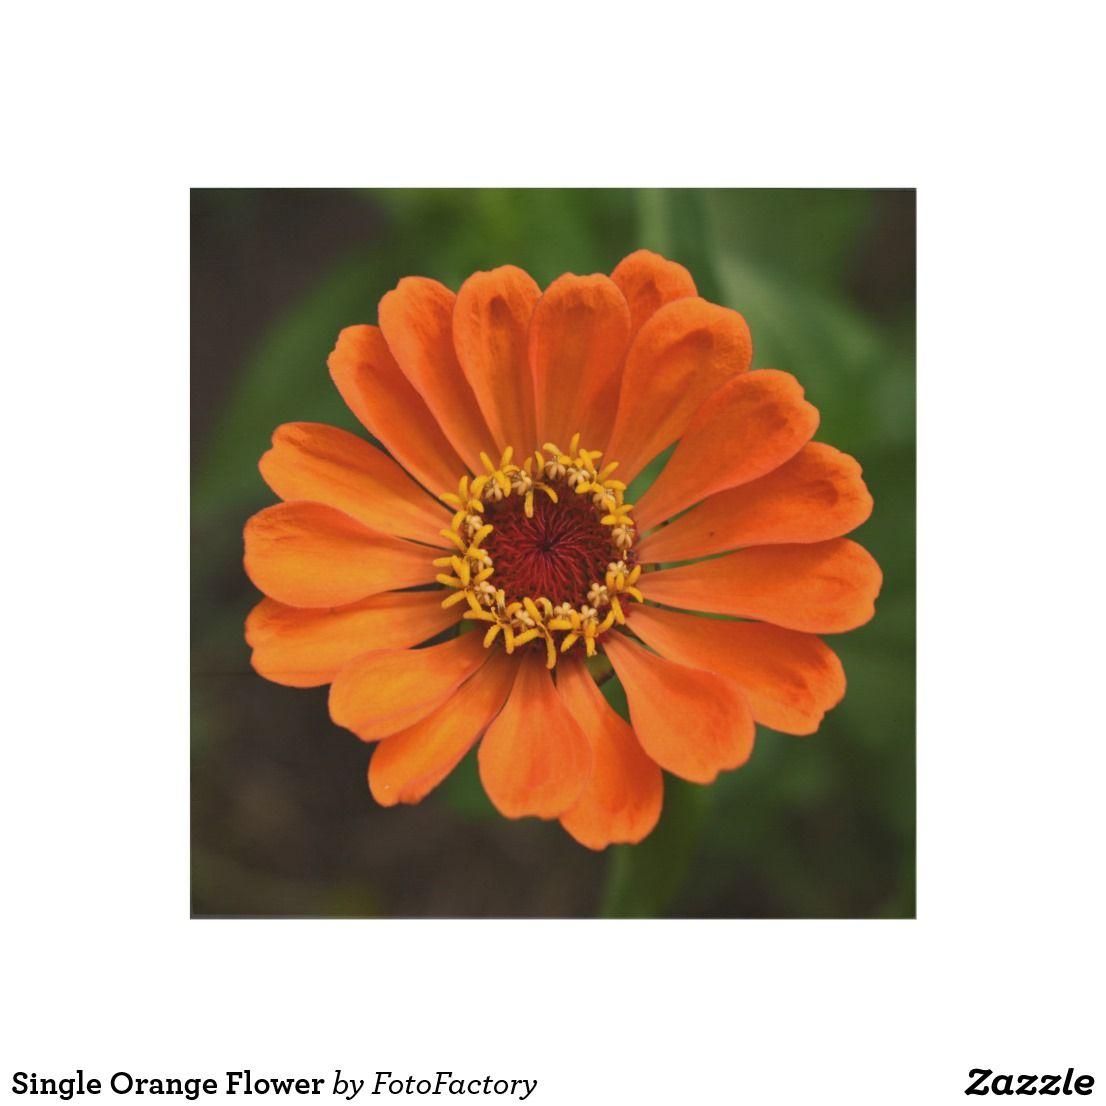 Single orange flower wood wall art flowers and foliage products